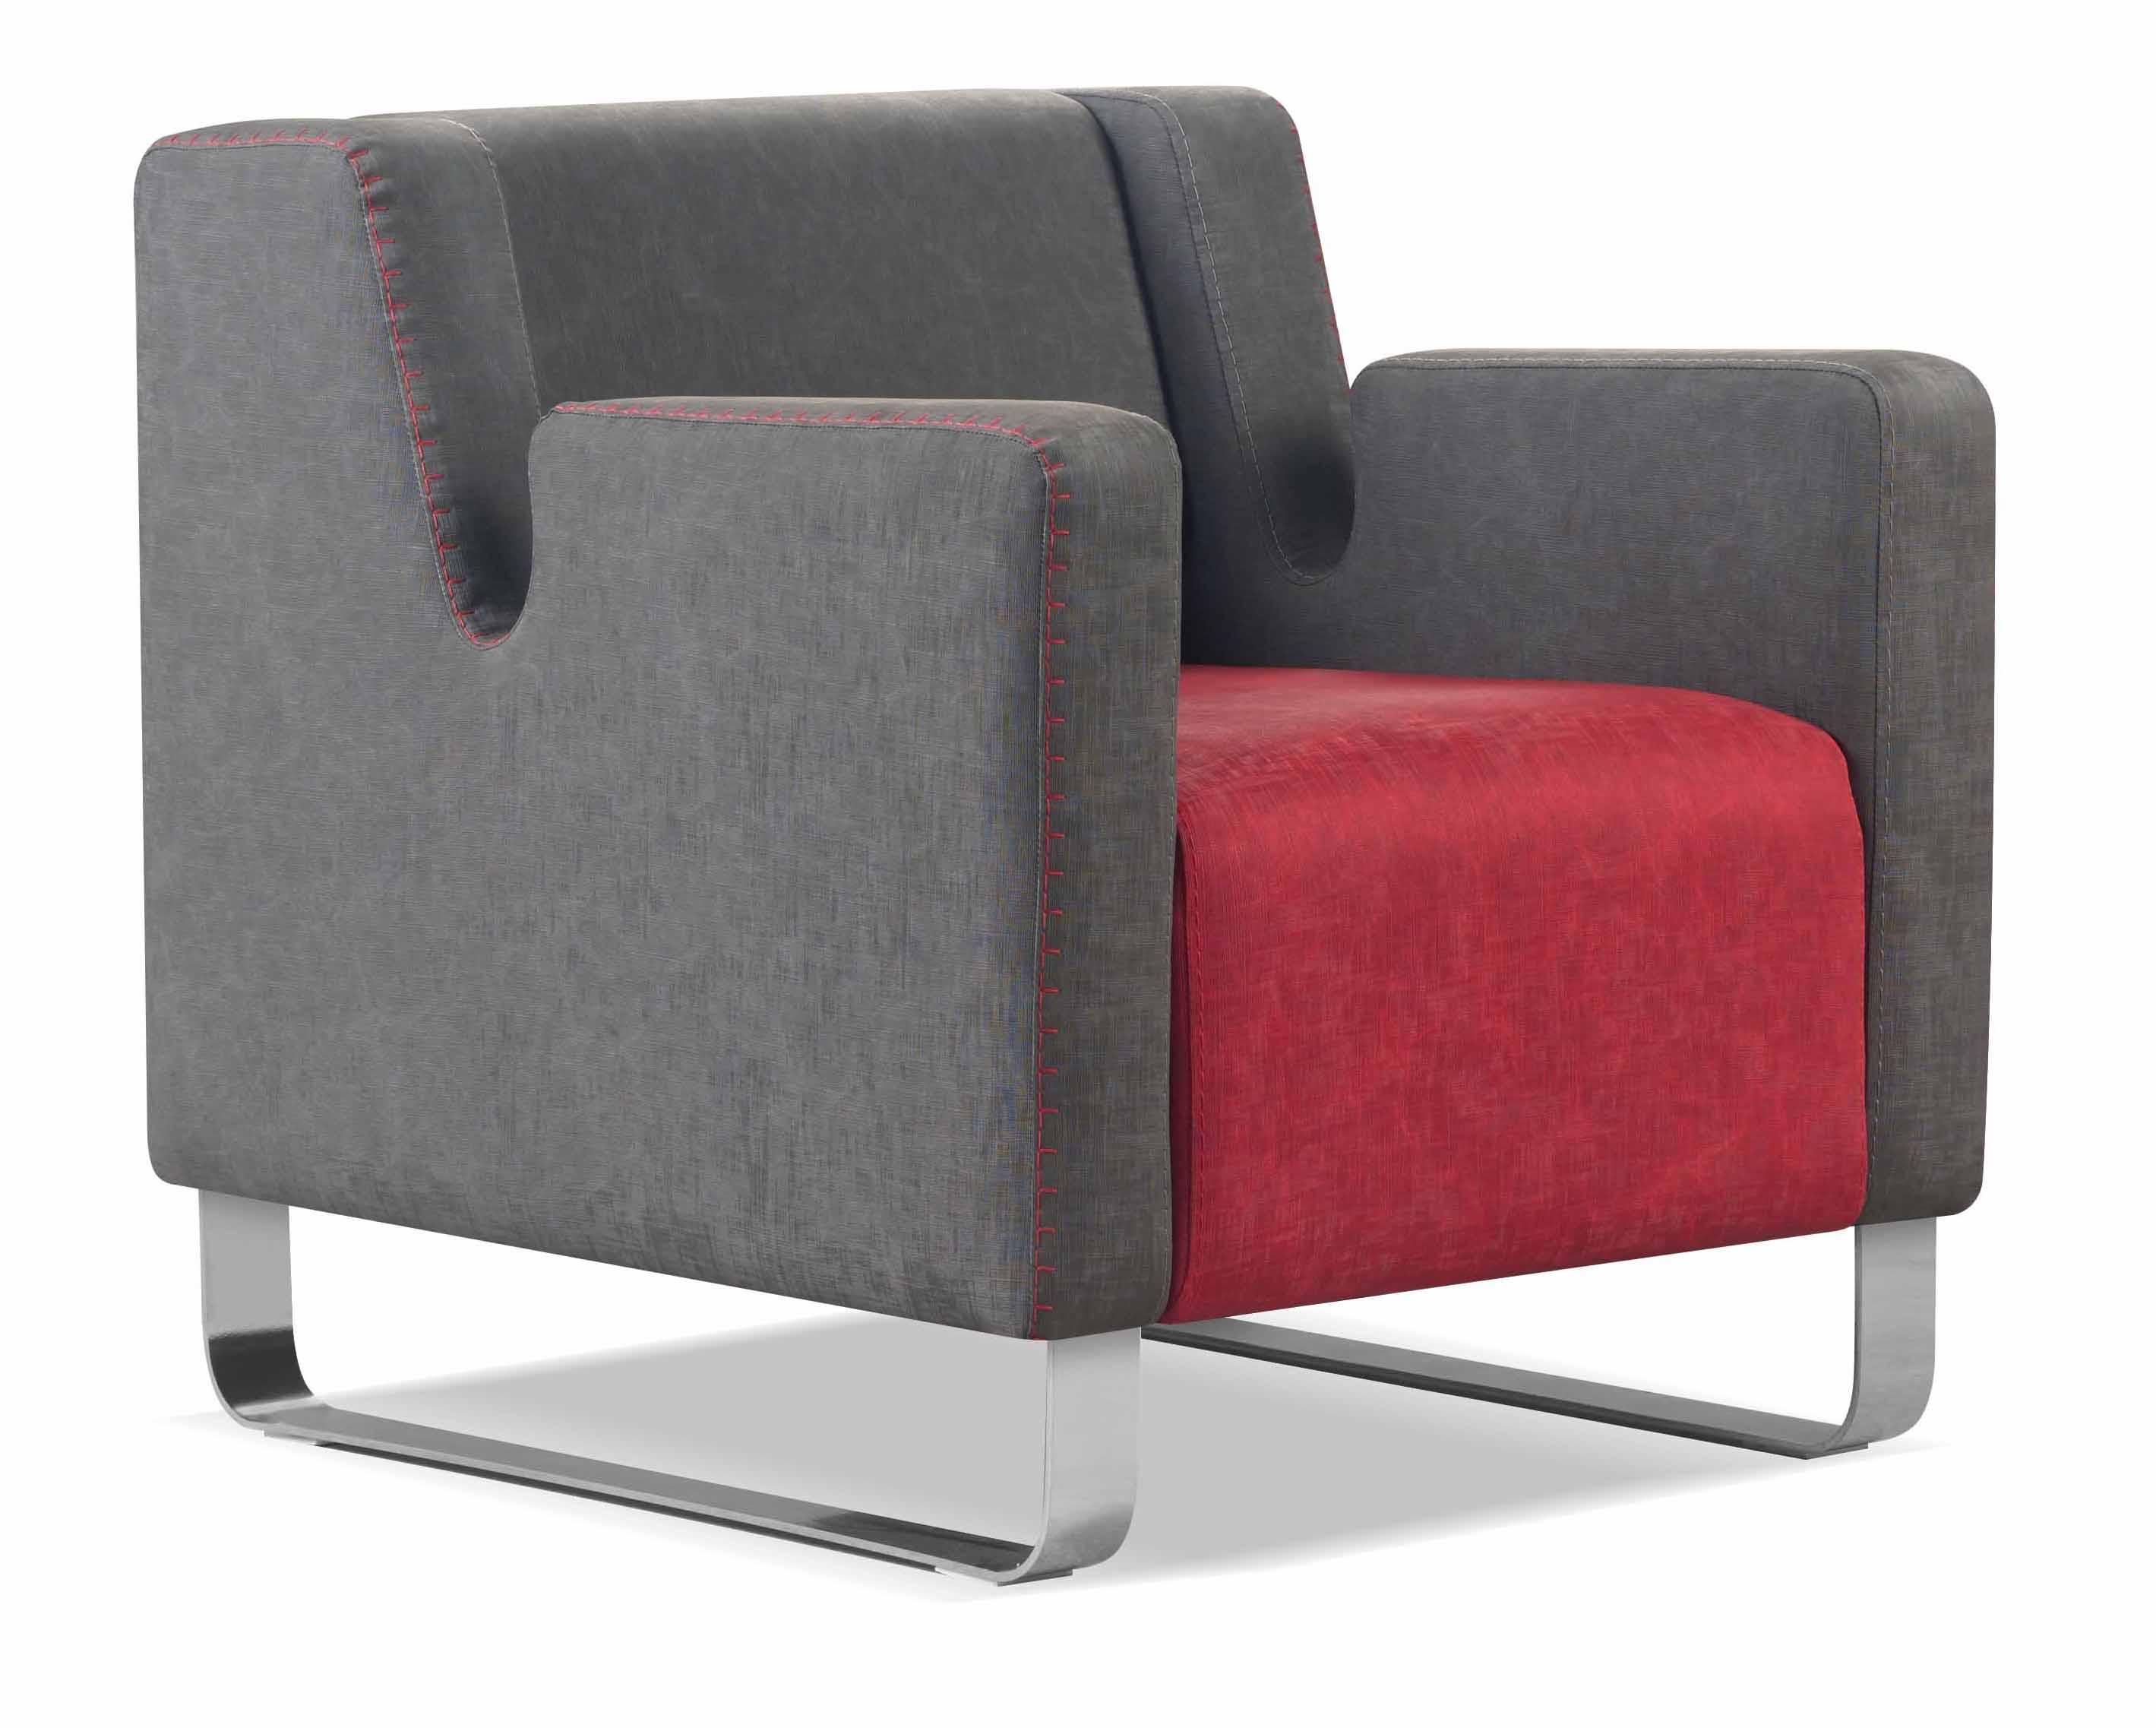 mango sitzgruppe aus sofa und 2 sesseln in bordeaux g nstig m bel star. Black Bedroom Furniture Sets. Home Design Ideas